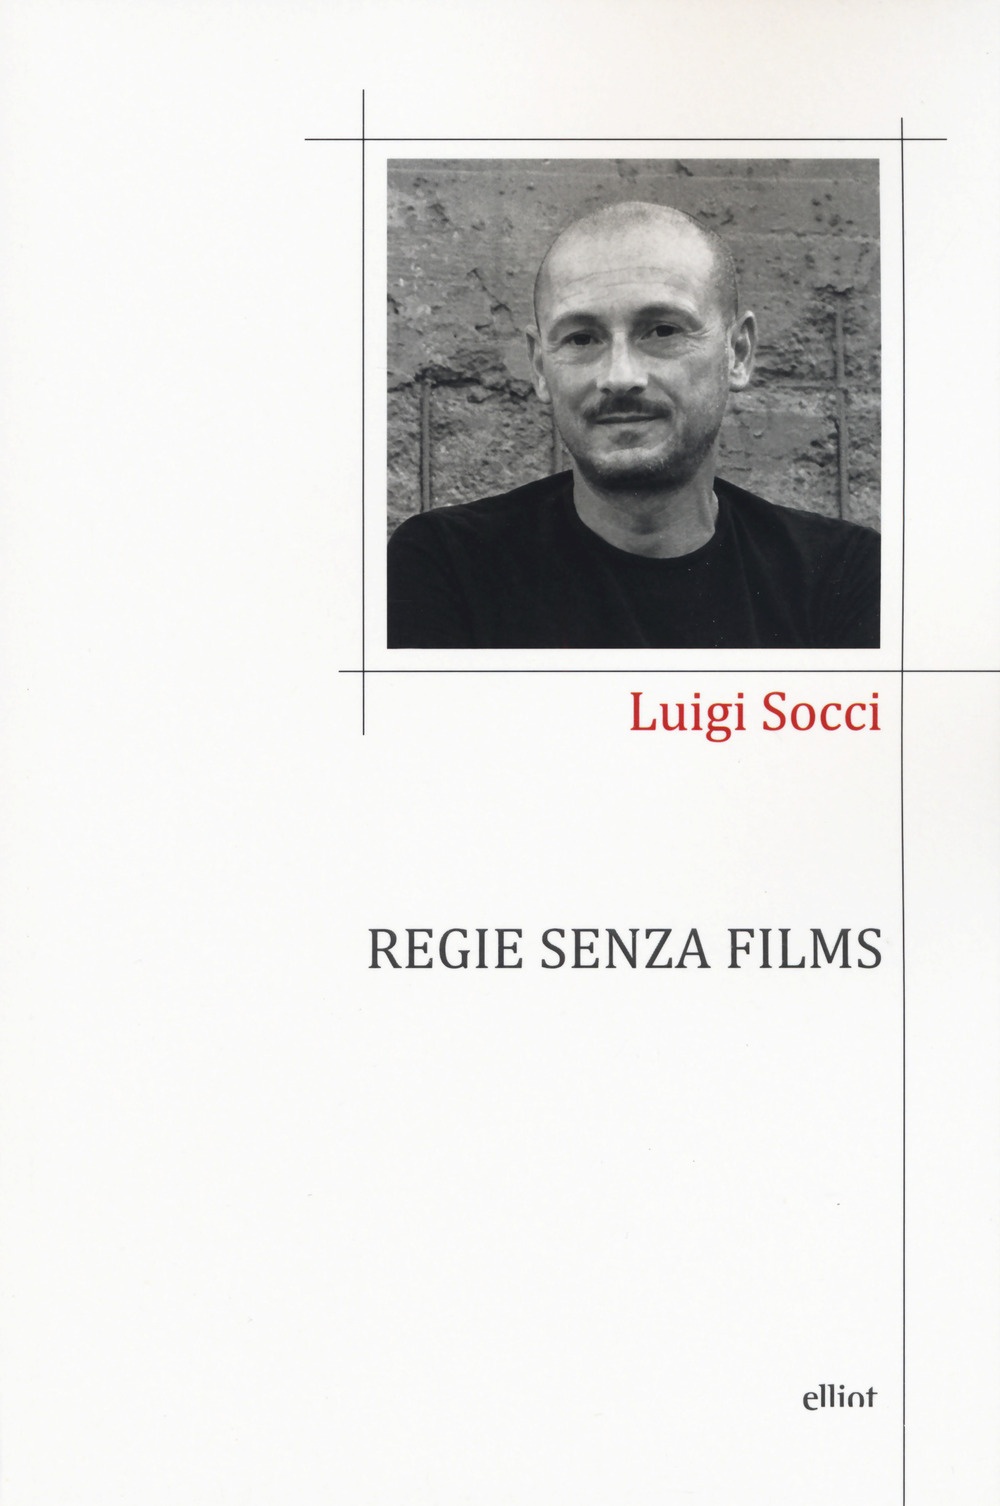 REGIE SENZA FILMS - Socci Luigi - 9788869939174